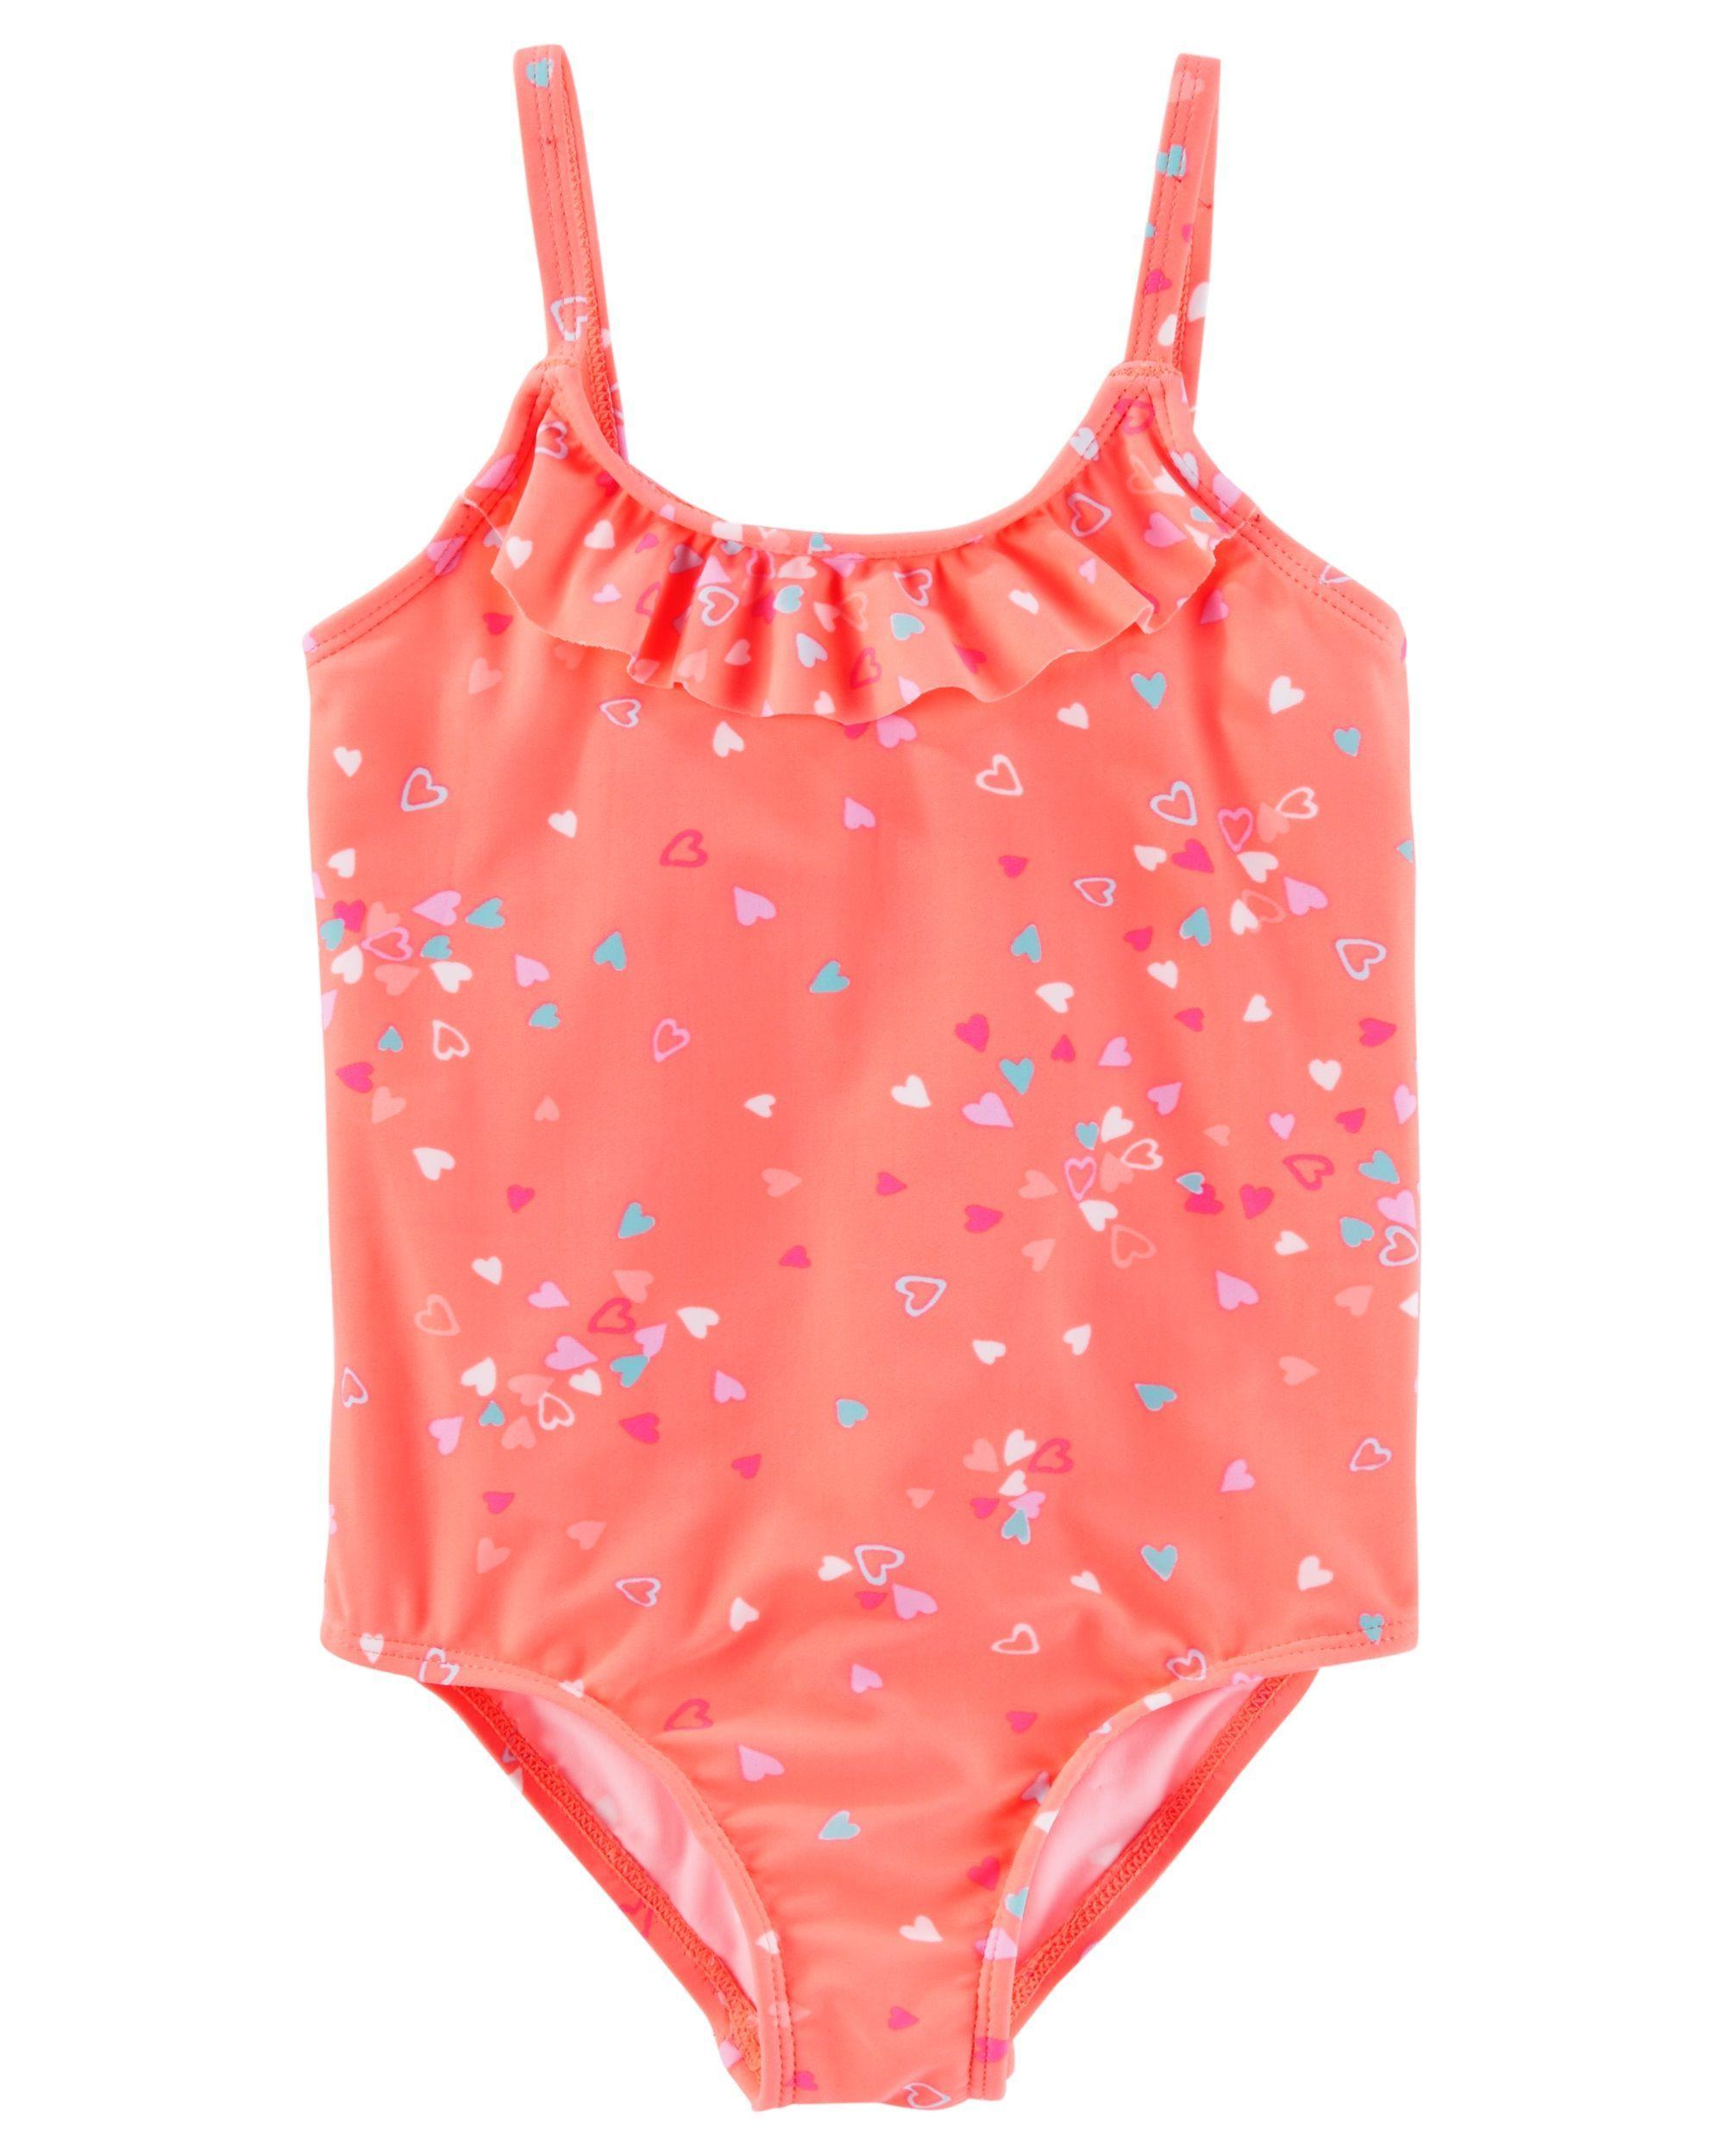 a01bf65d4e2df OshKosh B gosh Ruffle Heart Swimsuit